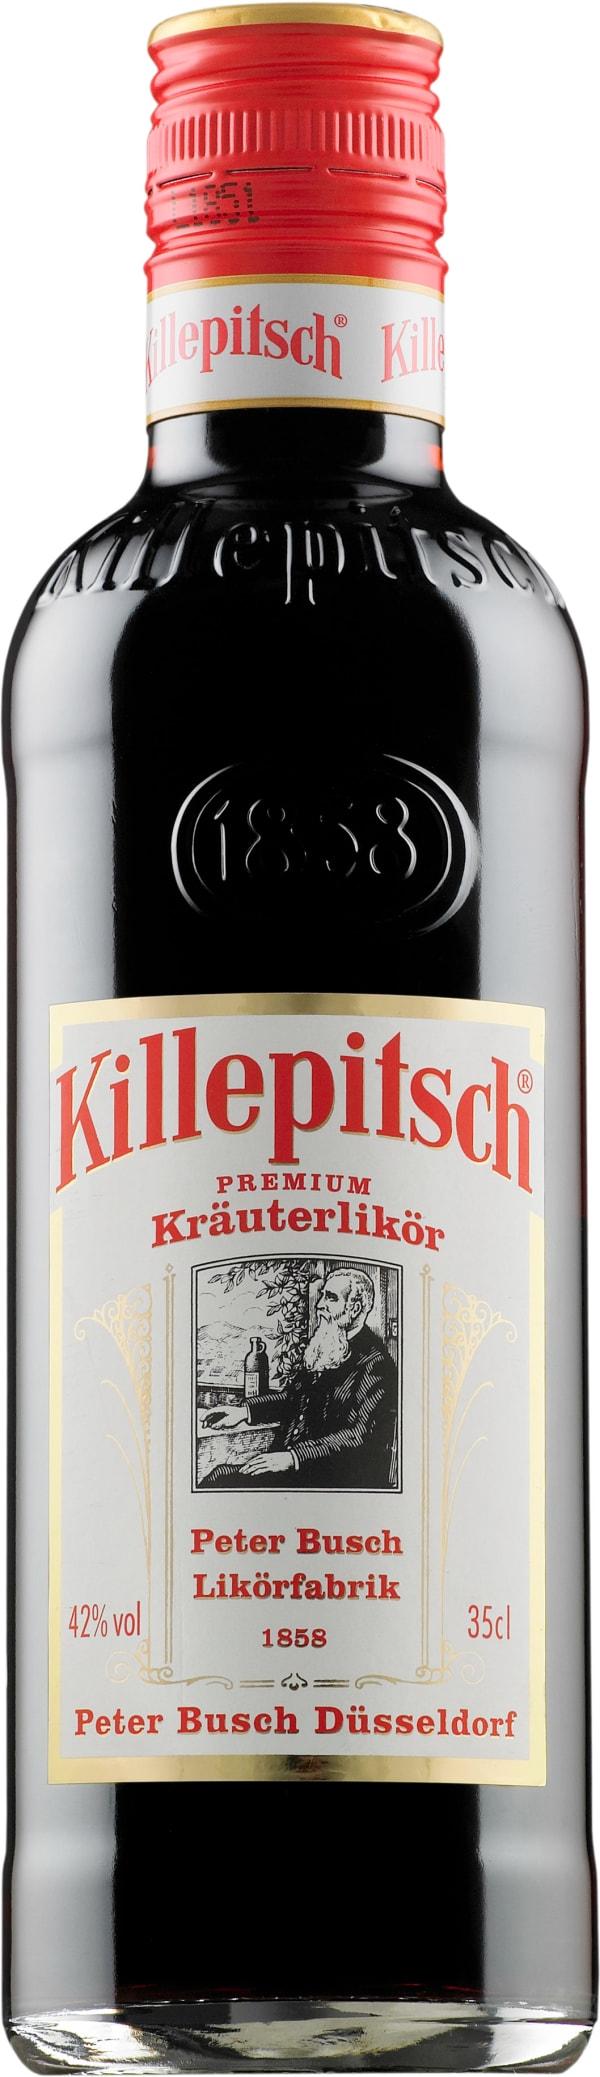 Killepitsch